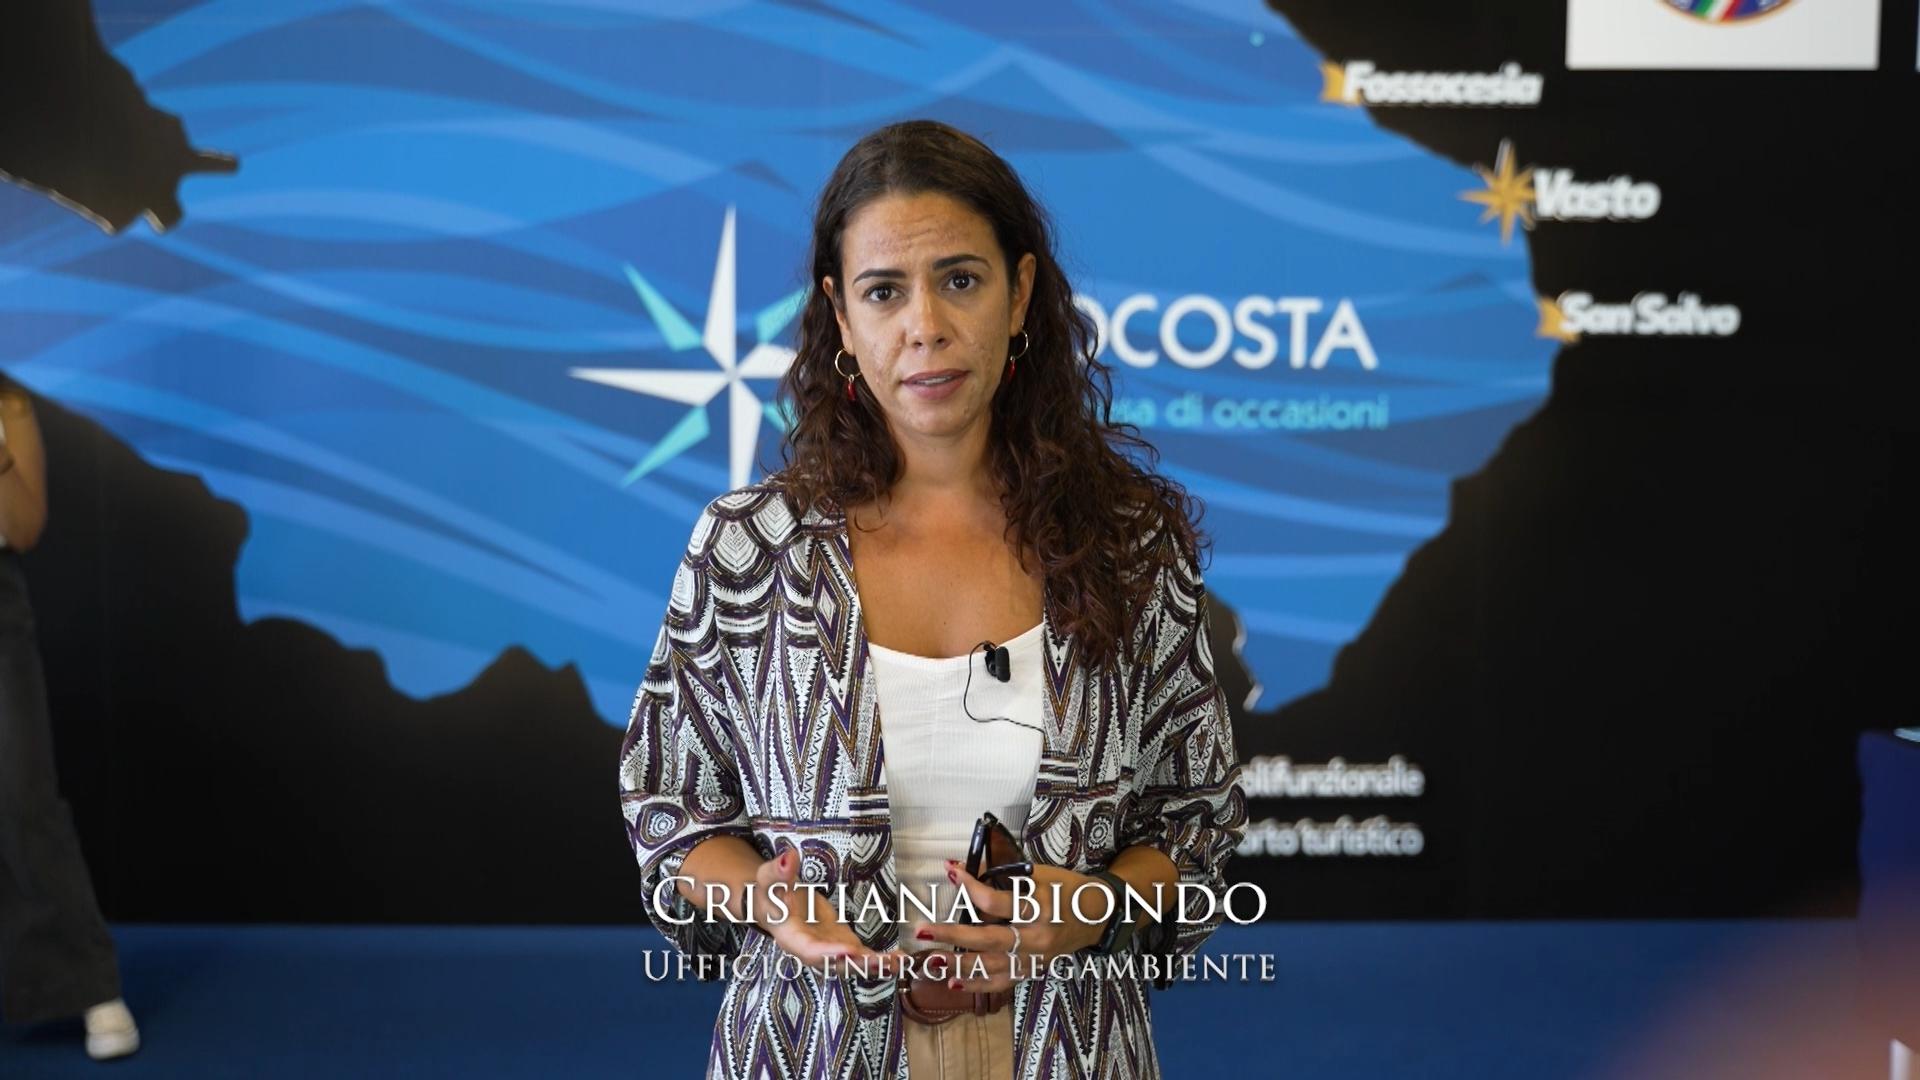 Cristiana Biondo